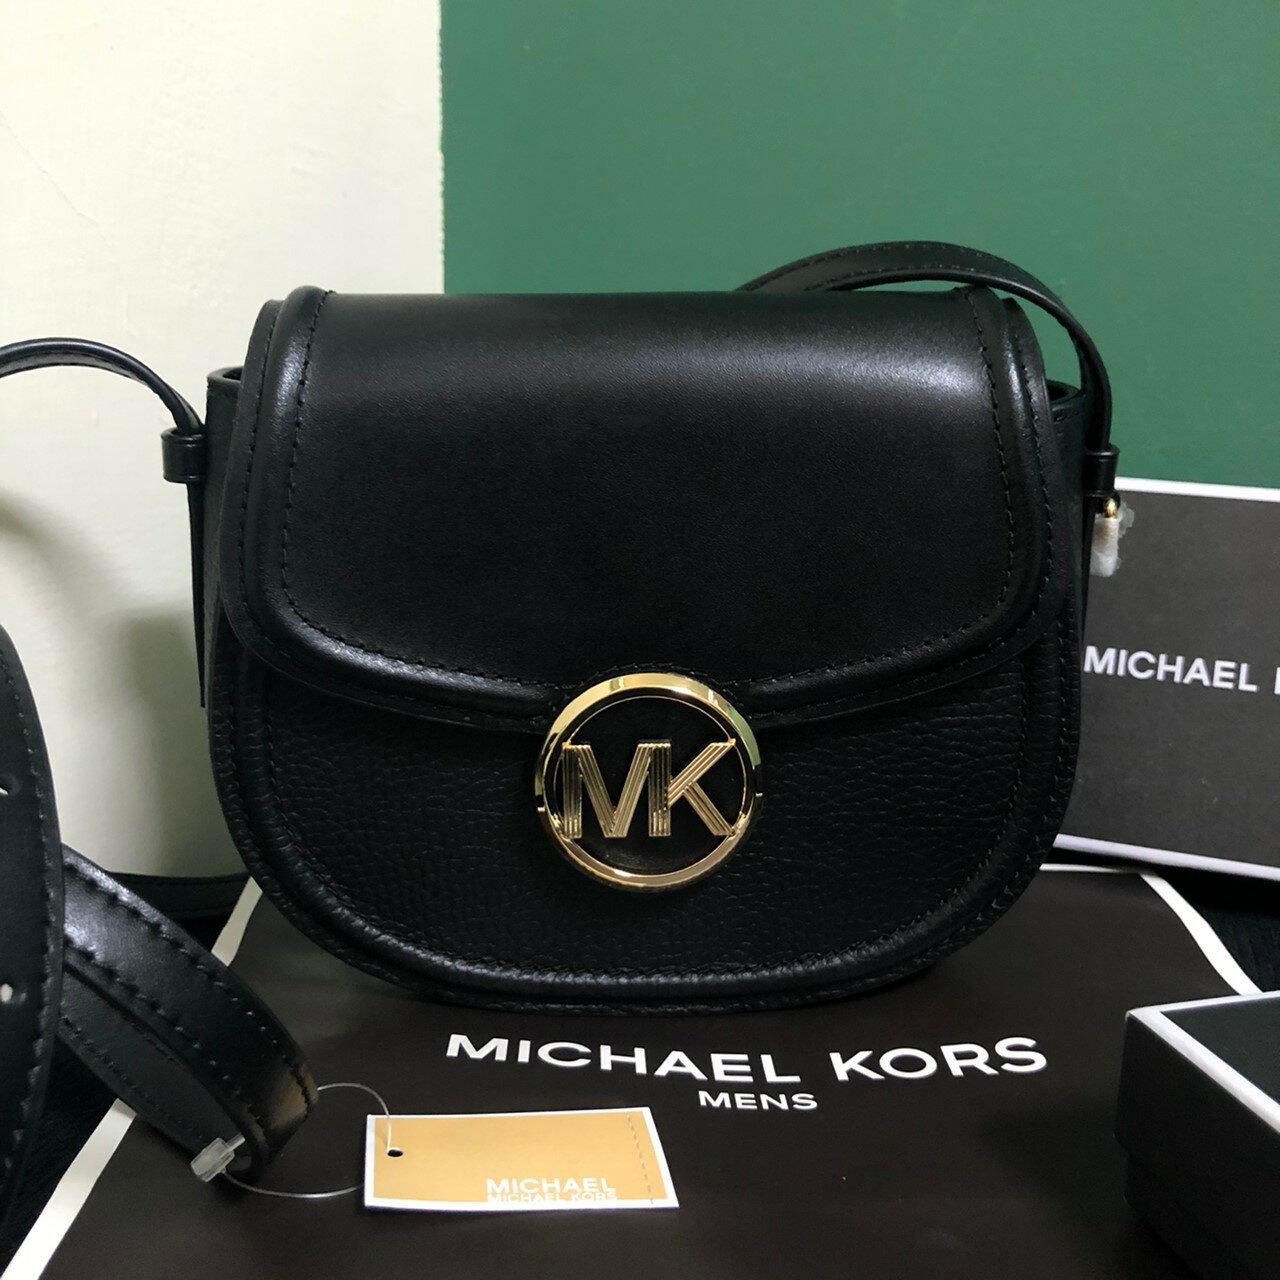 MK 經典logo真皮馬鞍包 經典黑 側背包 斜背包 手拿包 MICHAEL KORS 現貨 美國代購